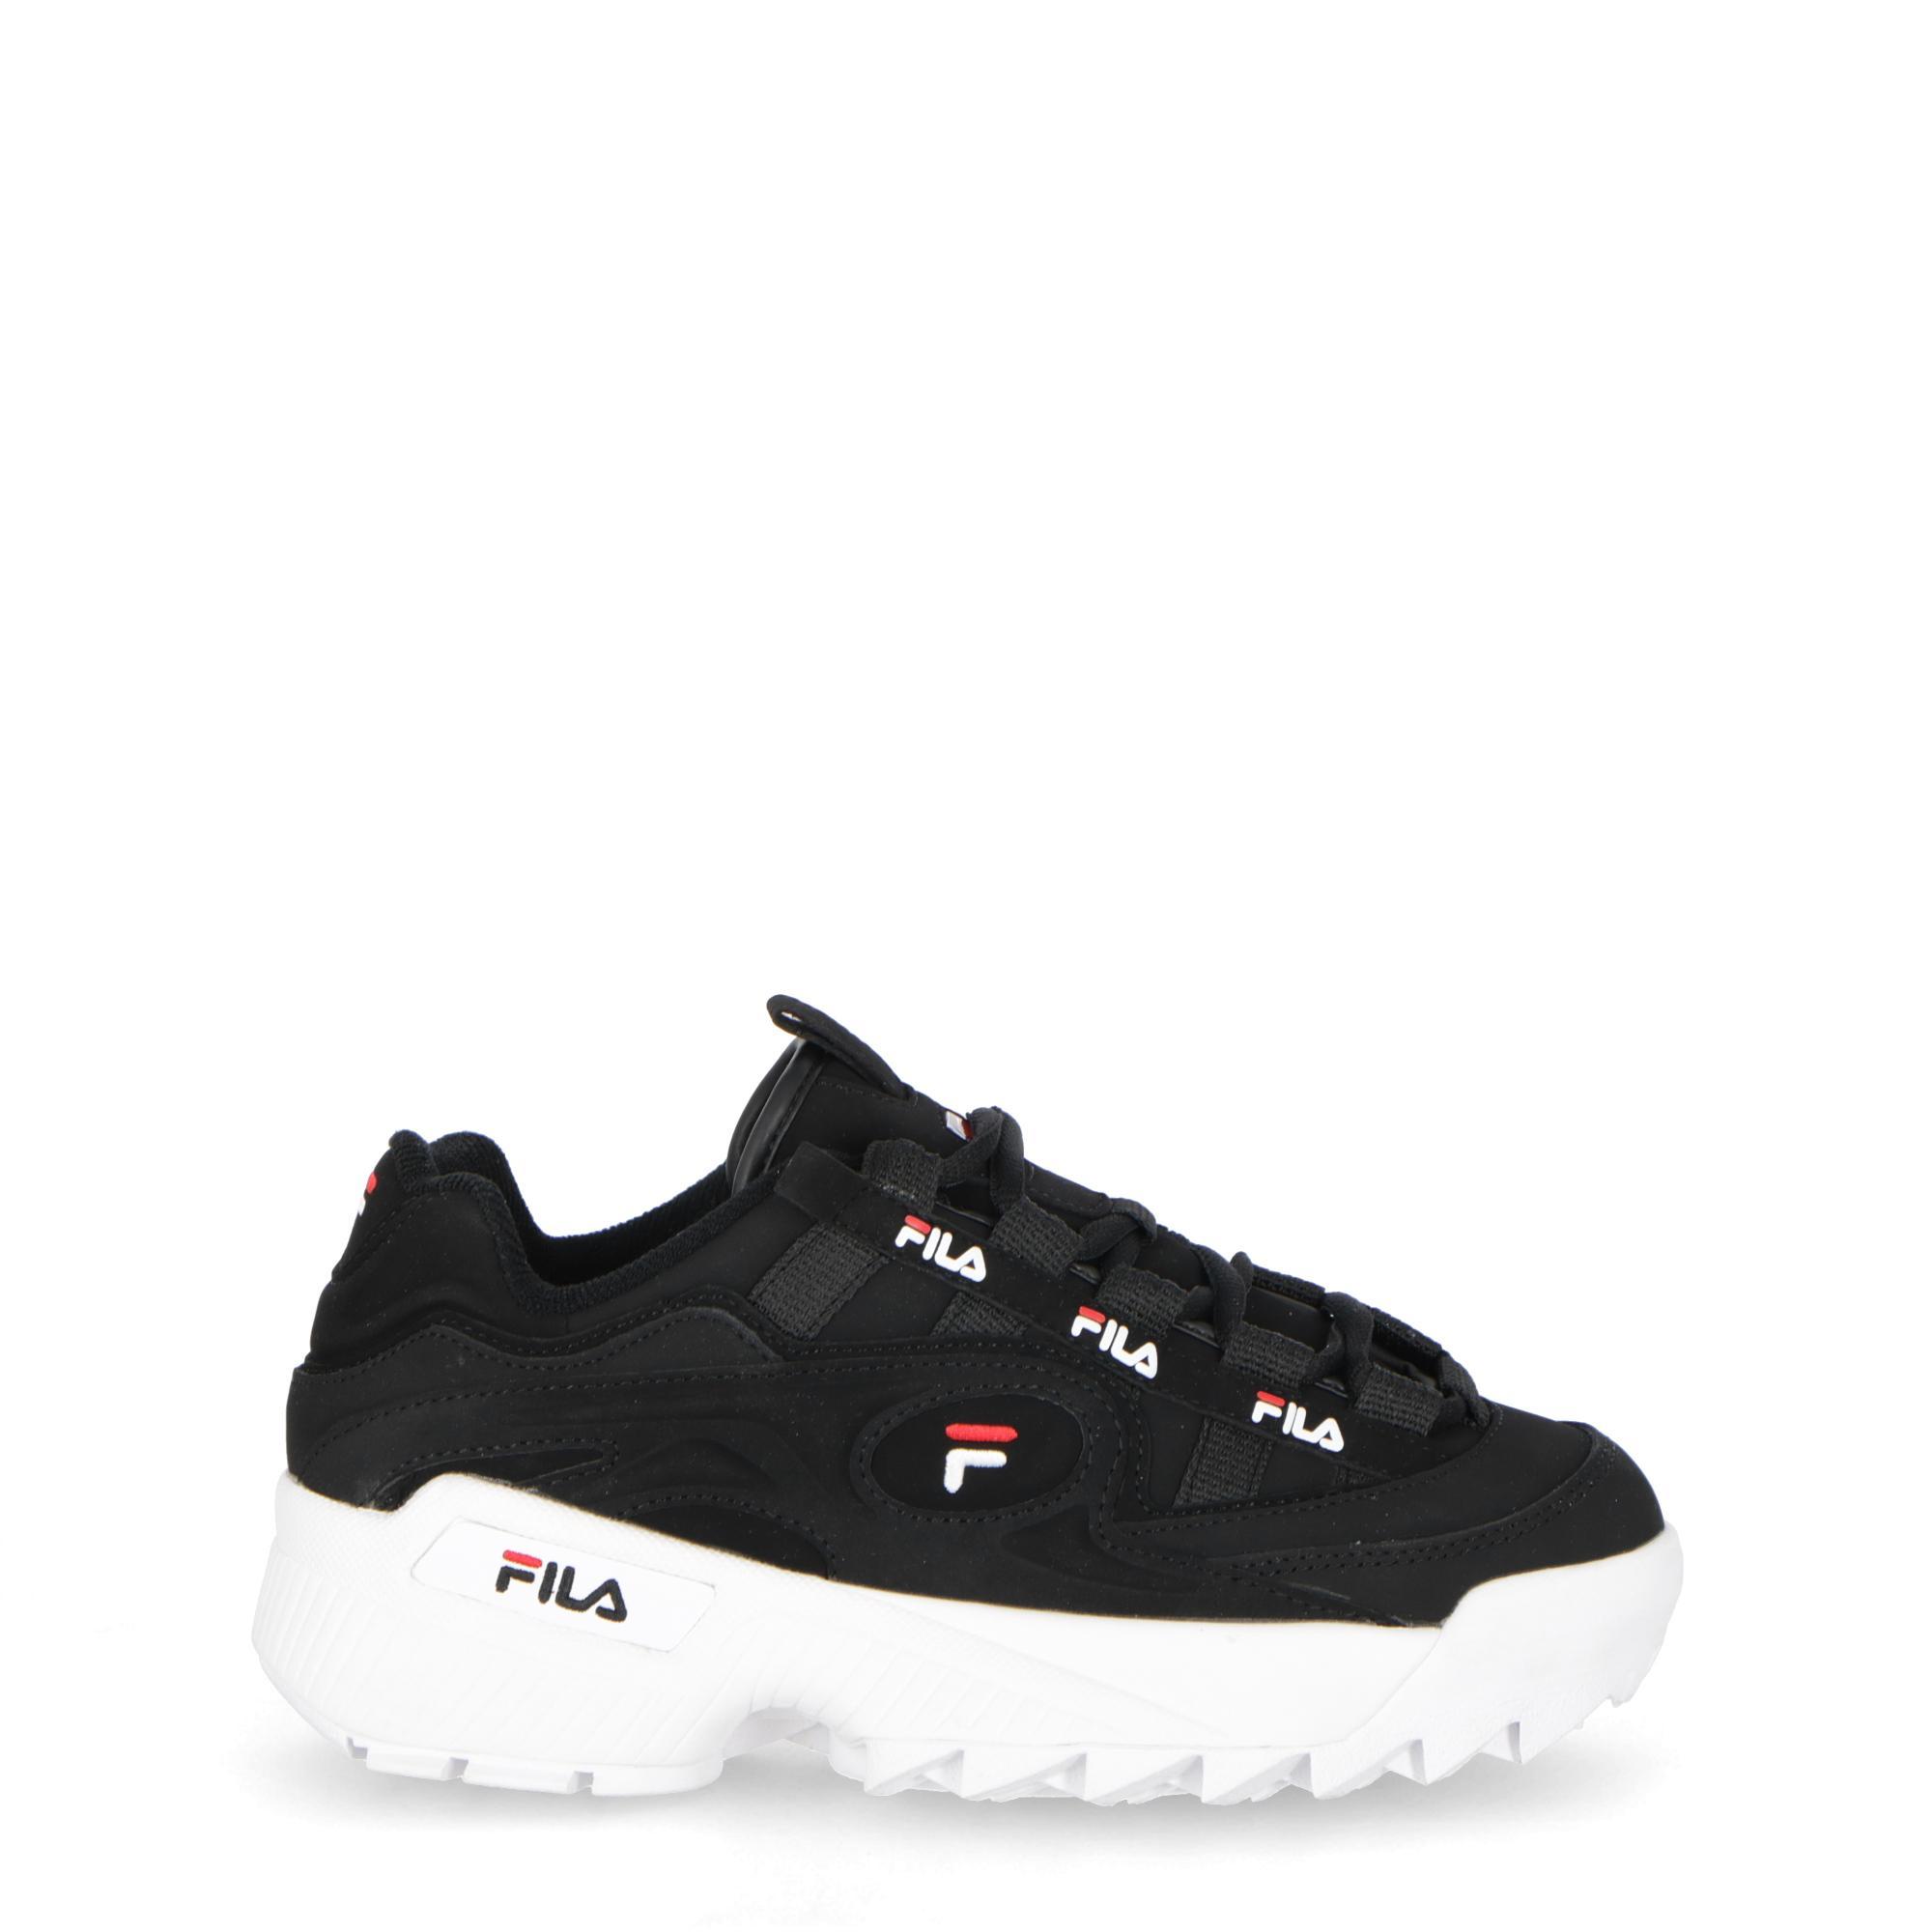 ff0c0c2c630 Fila D-formation Black white fila Red